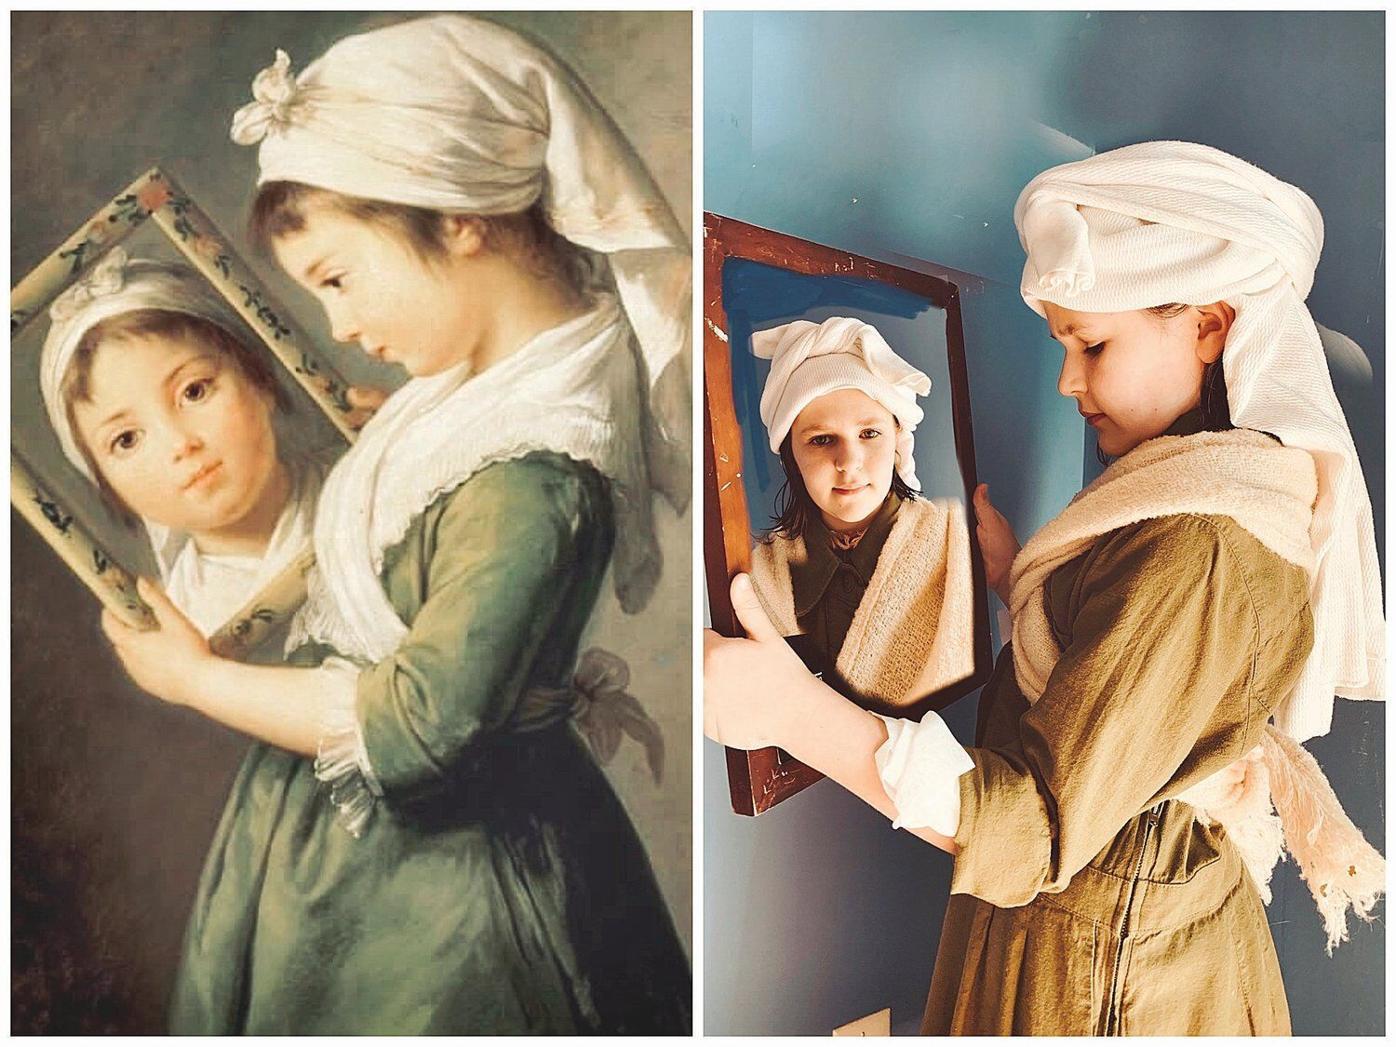 The art of family quarantine: Mom, dad, kids reenact paintings at home